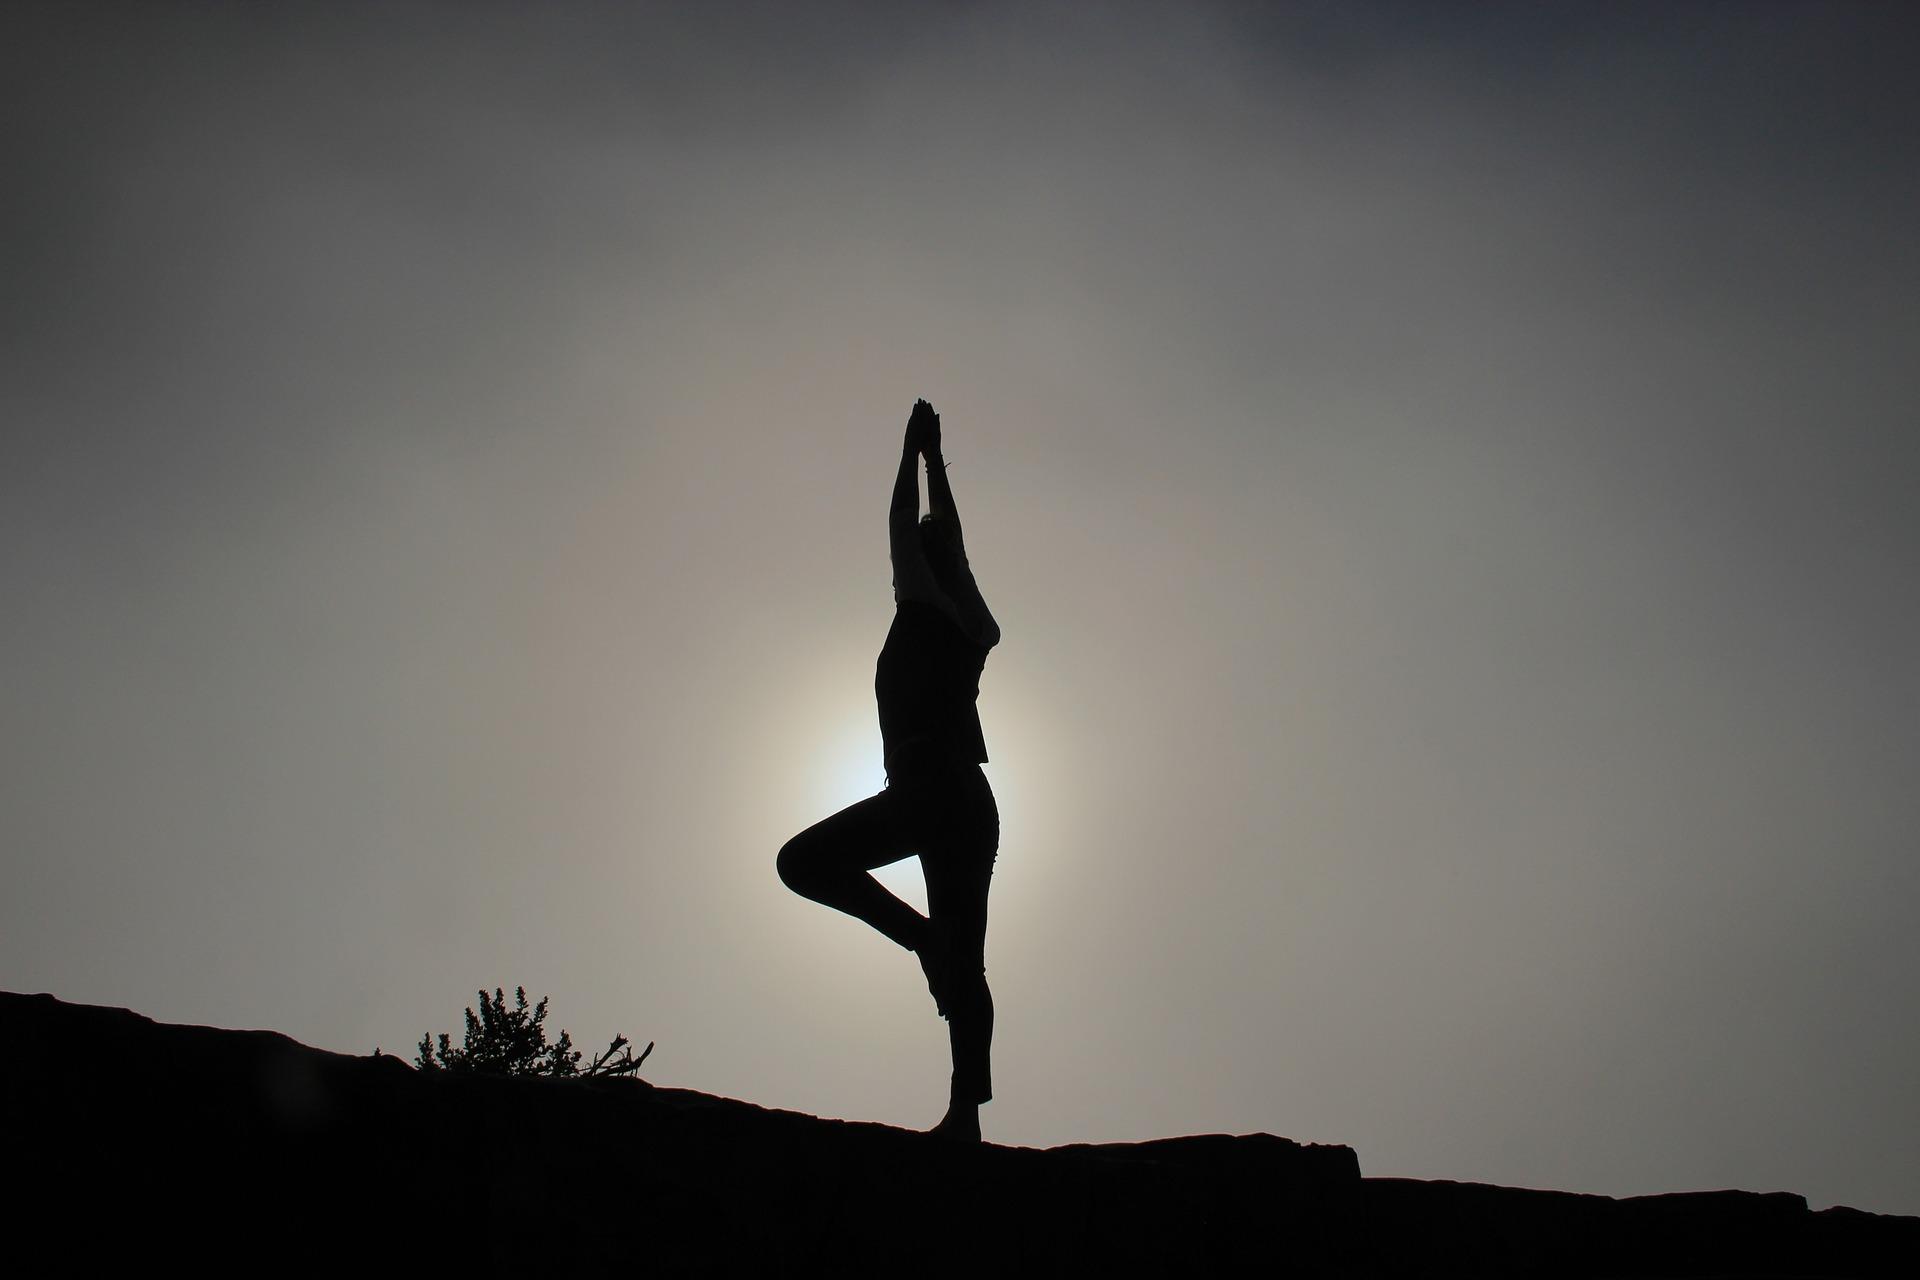 yoga-pose-1082172_1920.jpg